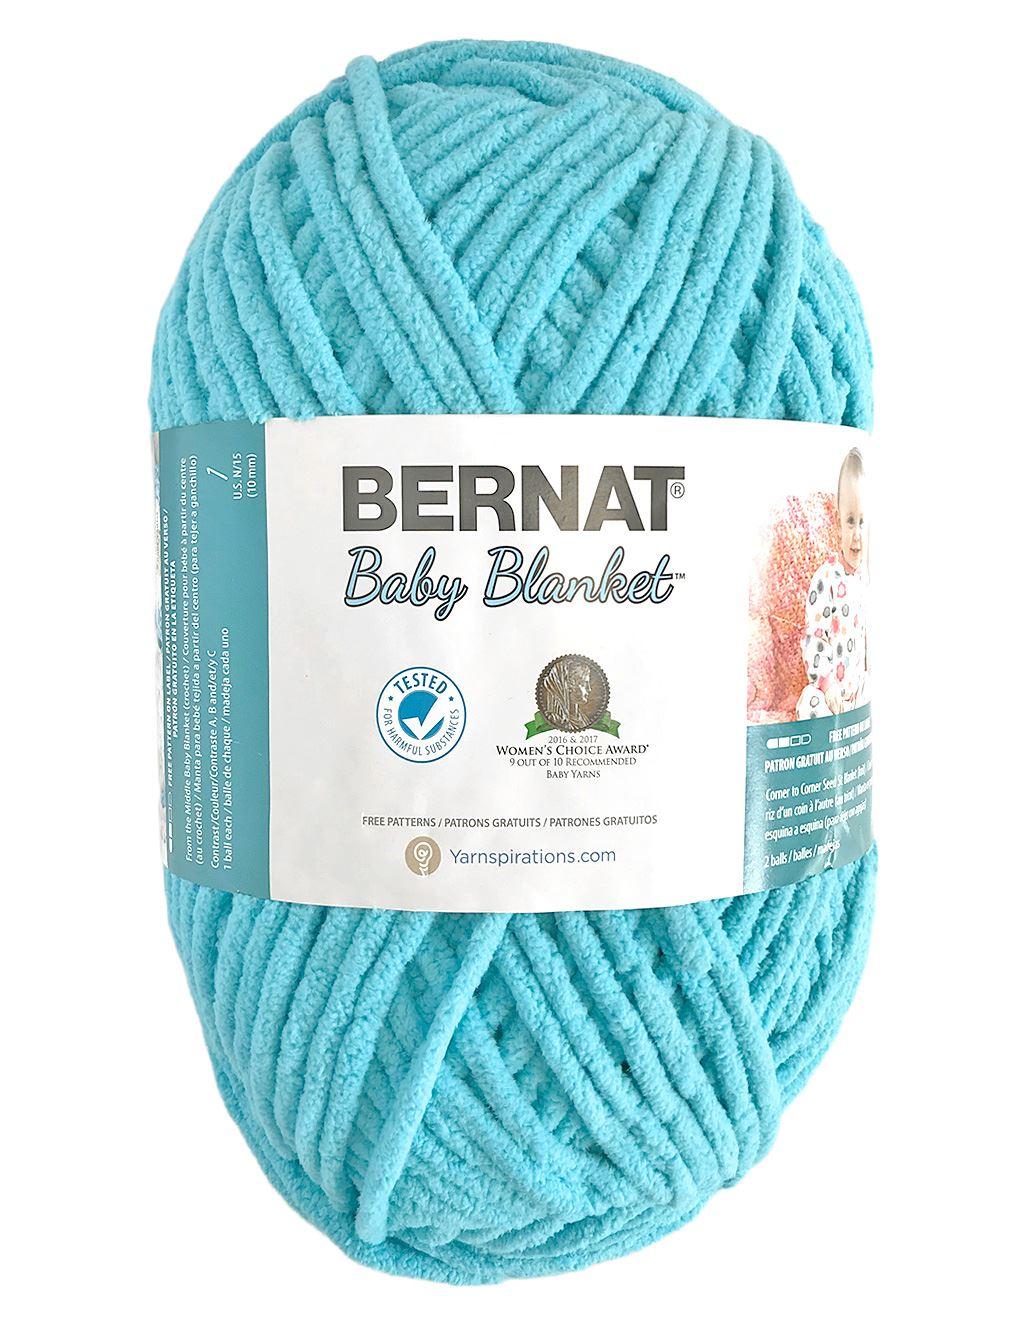 Bernat Baby Blanket Yarn 300g - Complete Range - Free Pattern   eBay